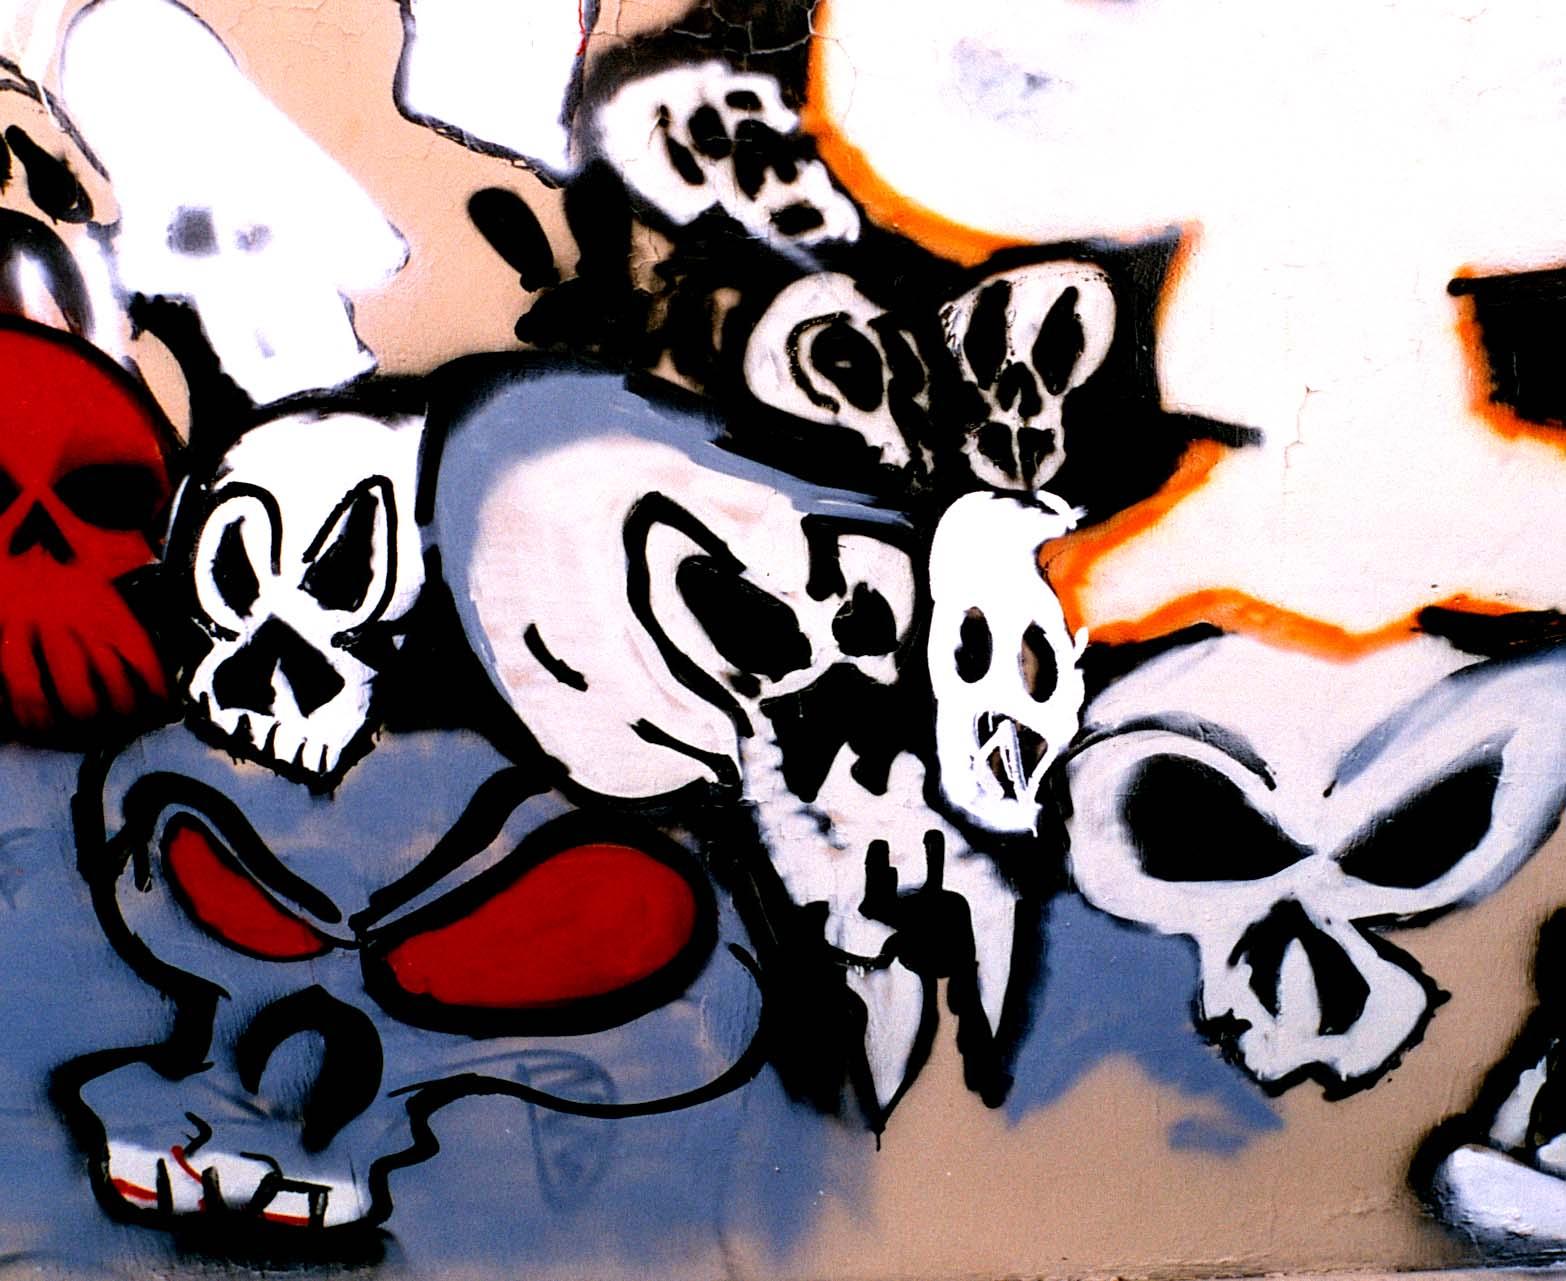 2005-phx-colorskulls-4